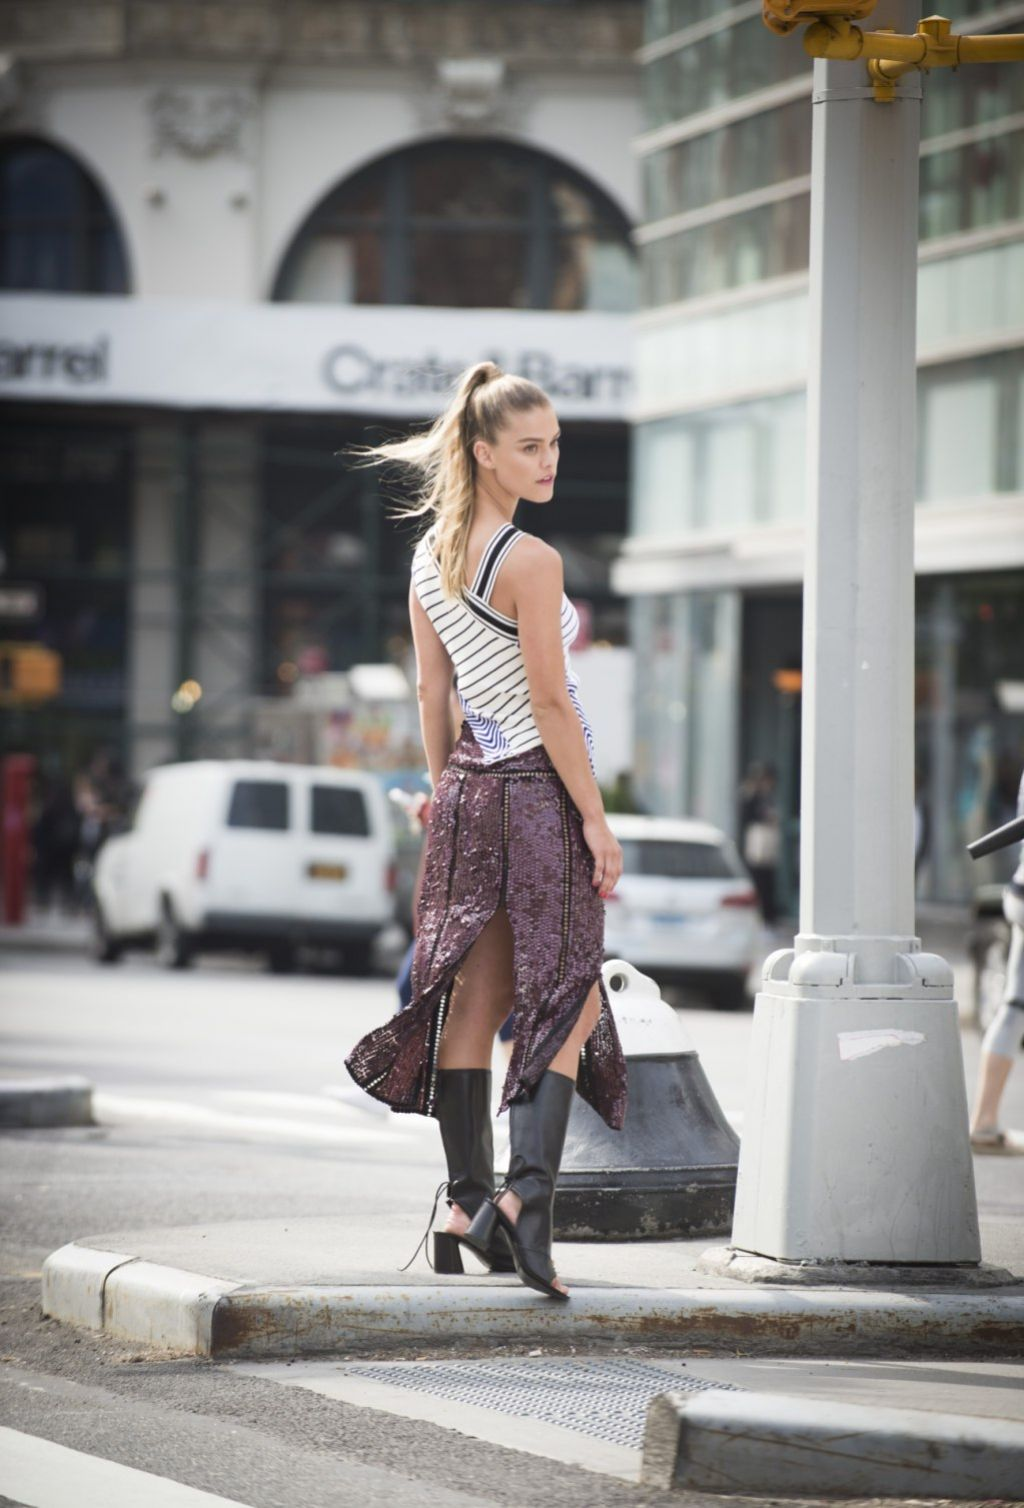 Nina Agdal  Photoshoot in New York City 4252016